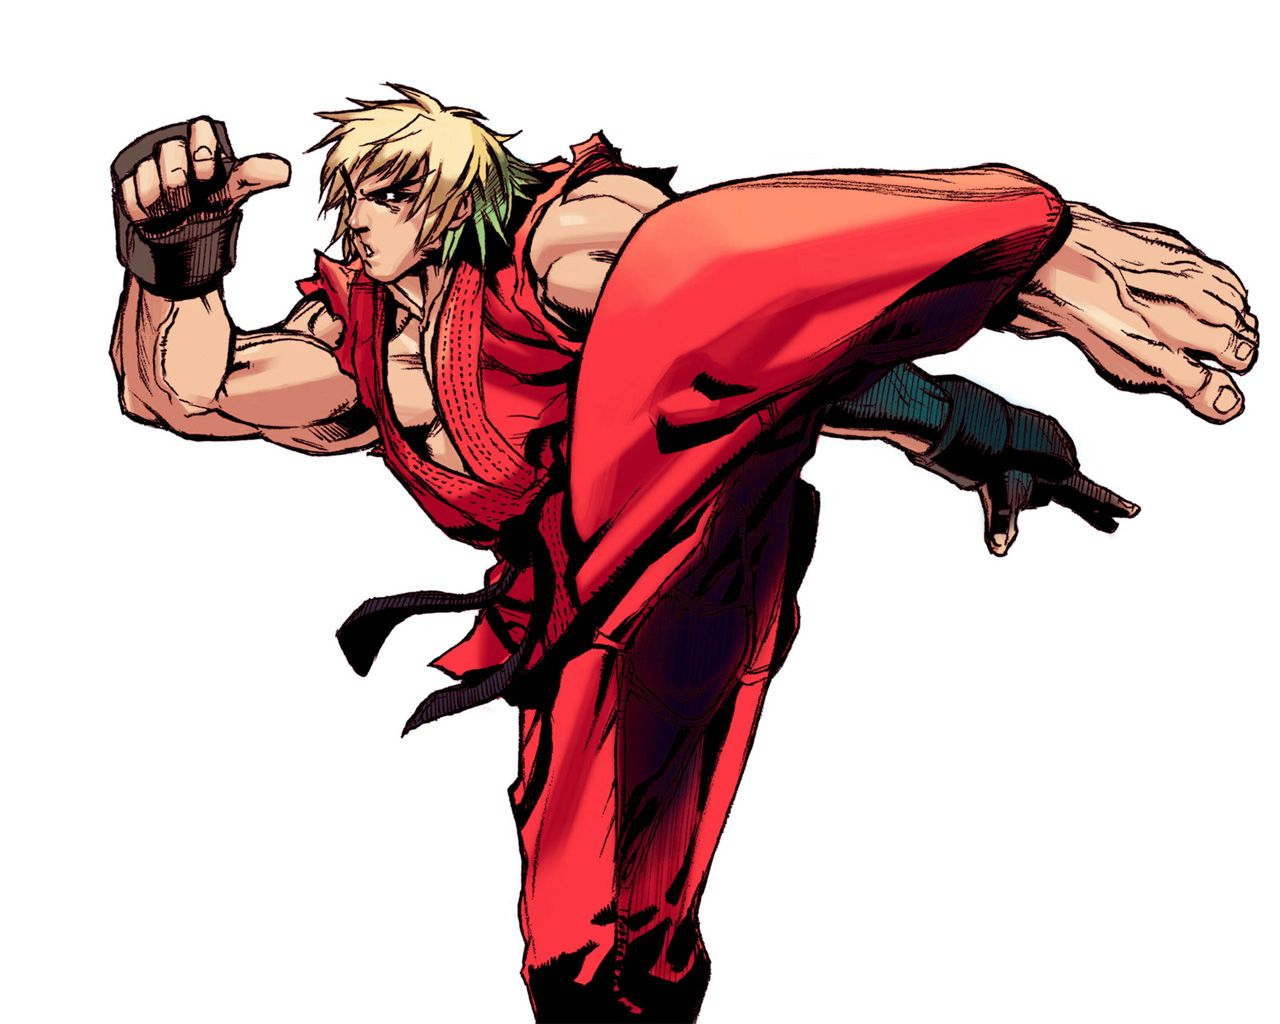 Ken Masters Street Fighter Wallpaper 1280x1024